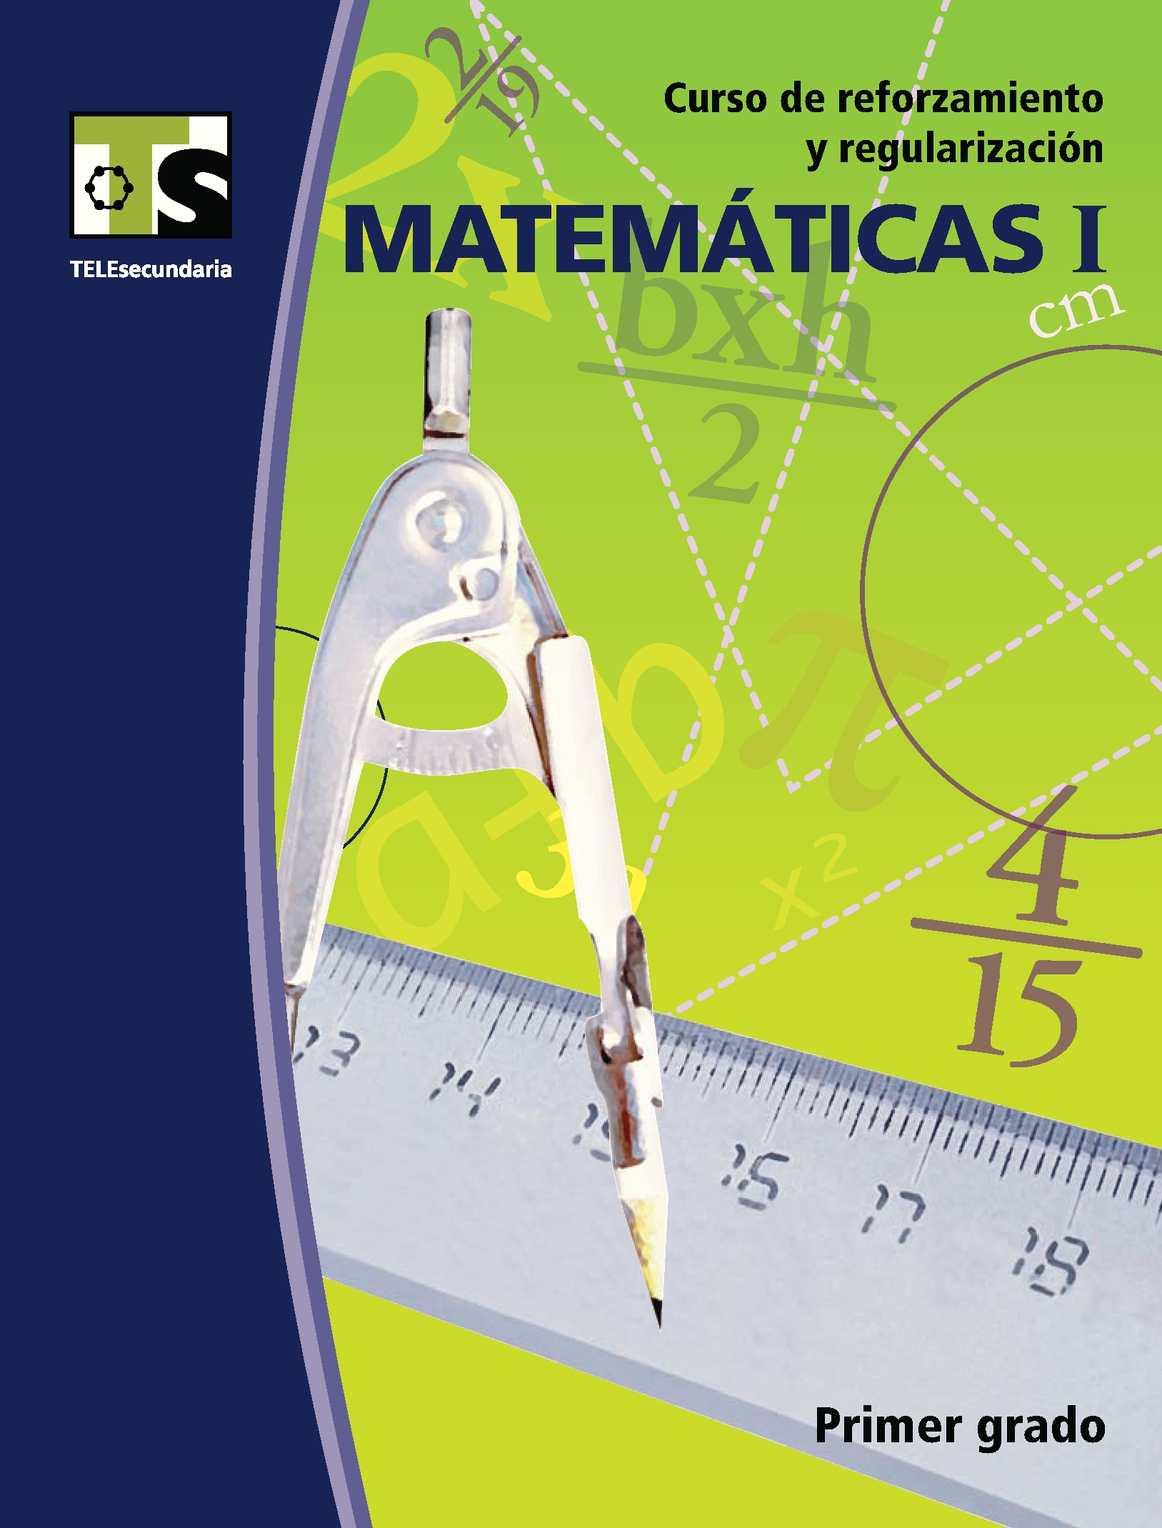 Regularizacion en matematicas 1er grado